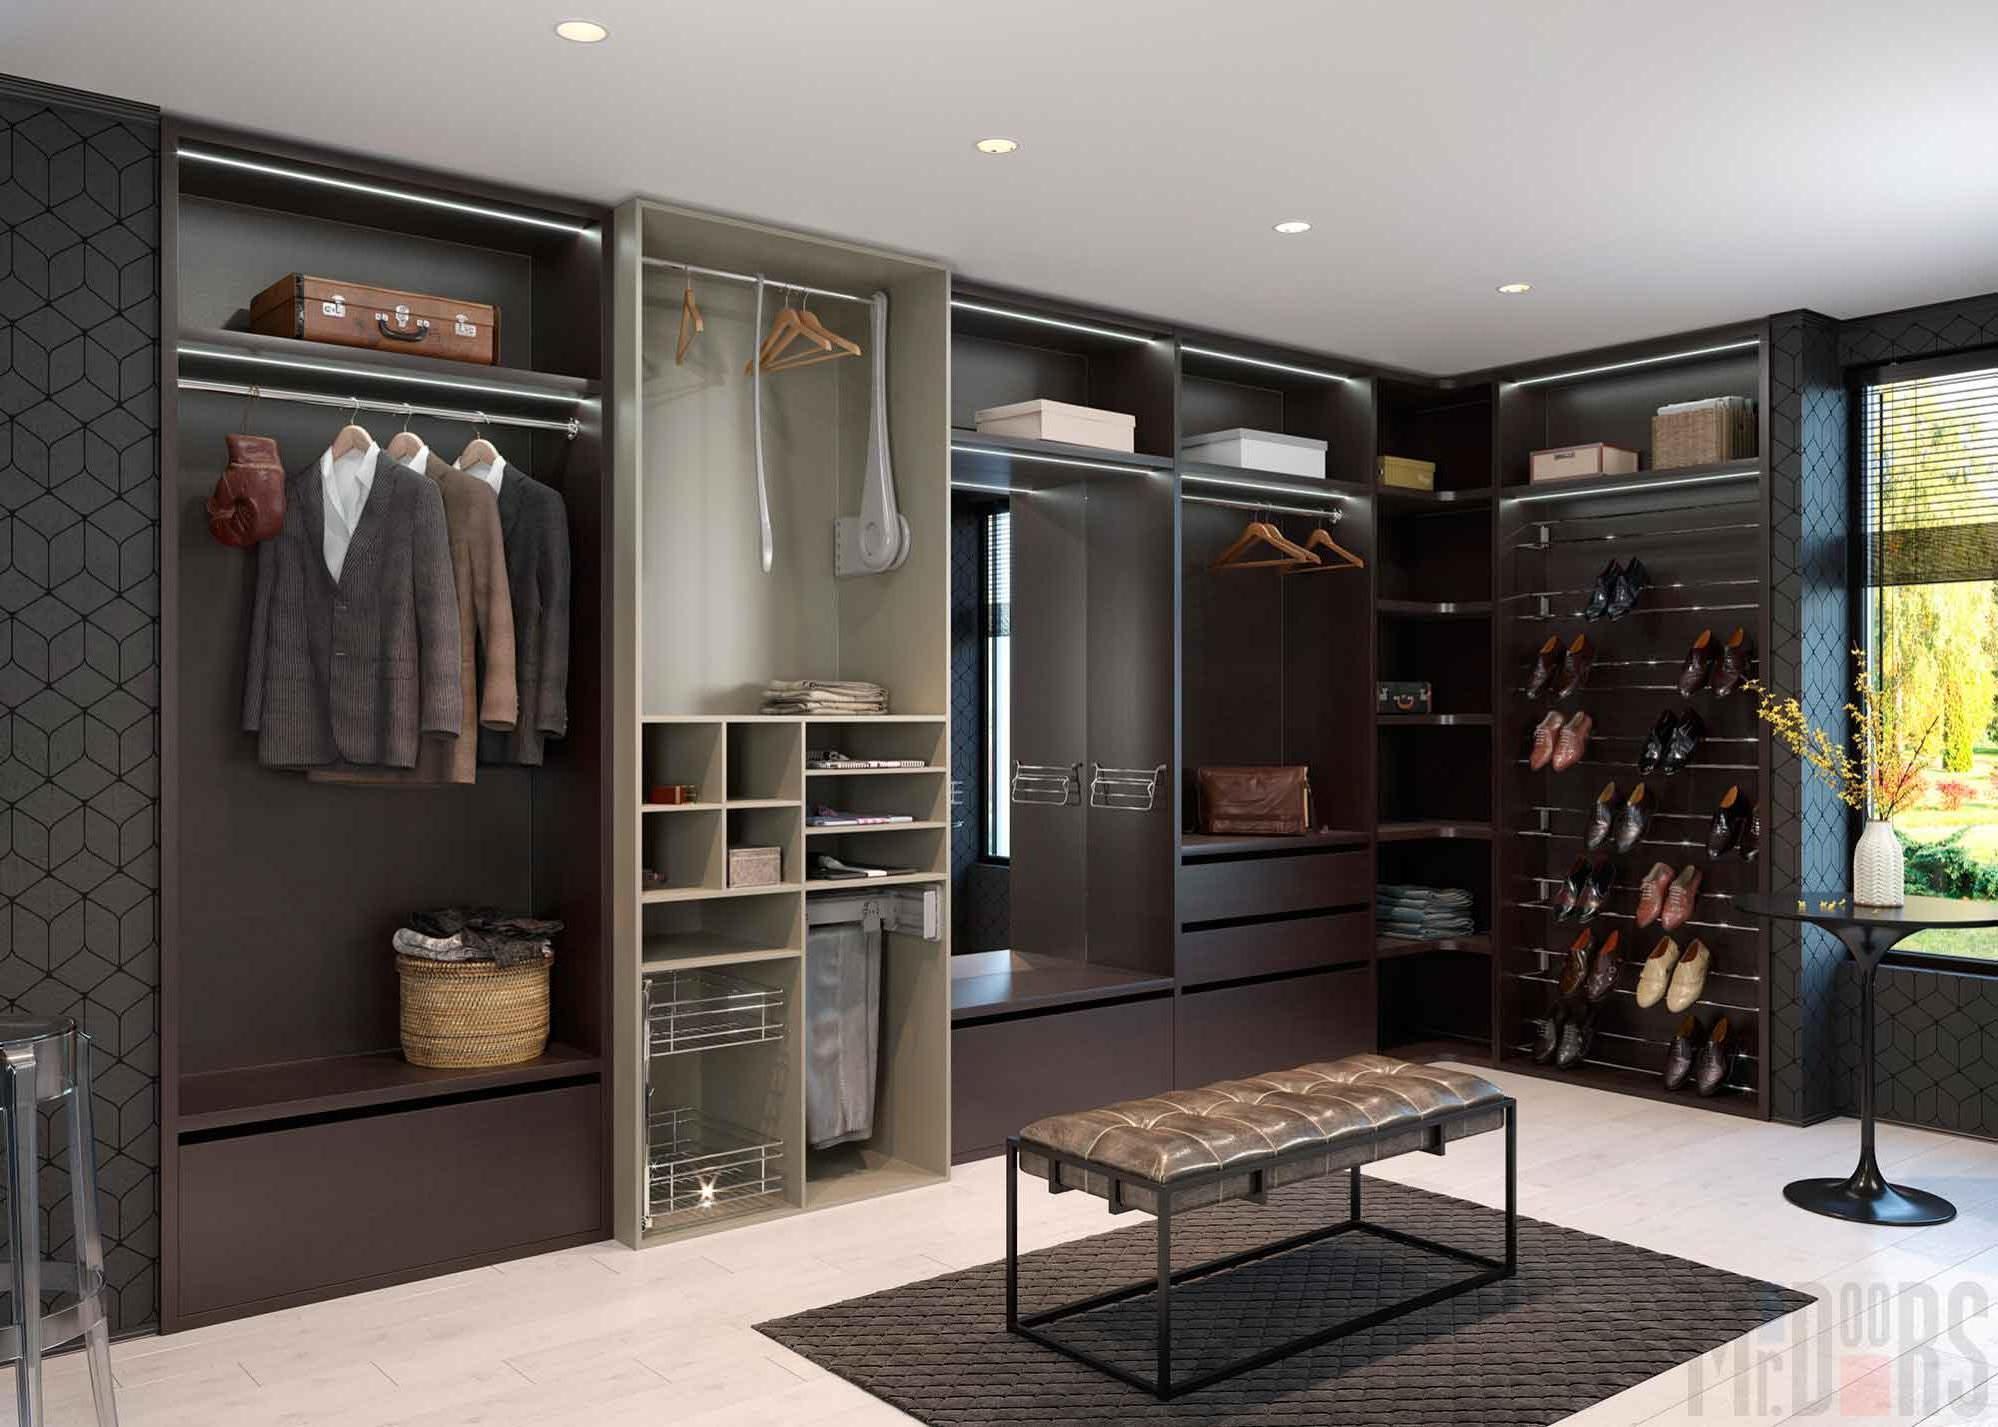 Interior design of the dark wardrobe room